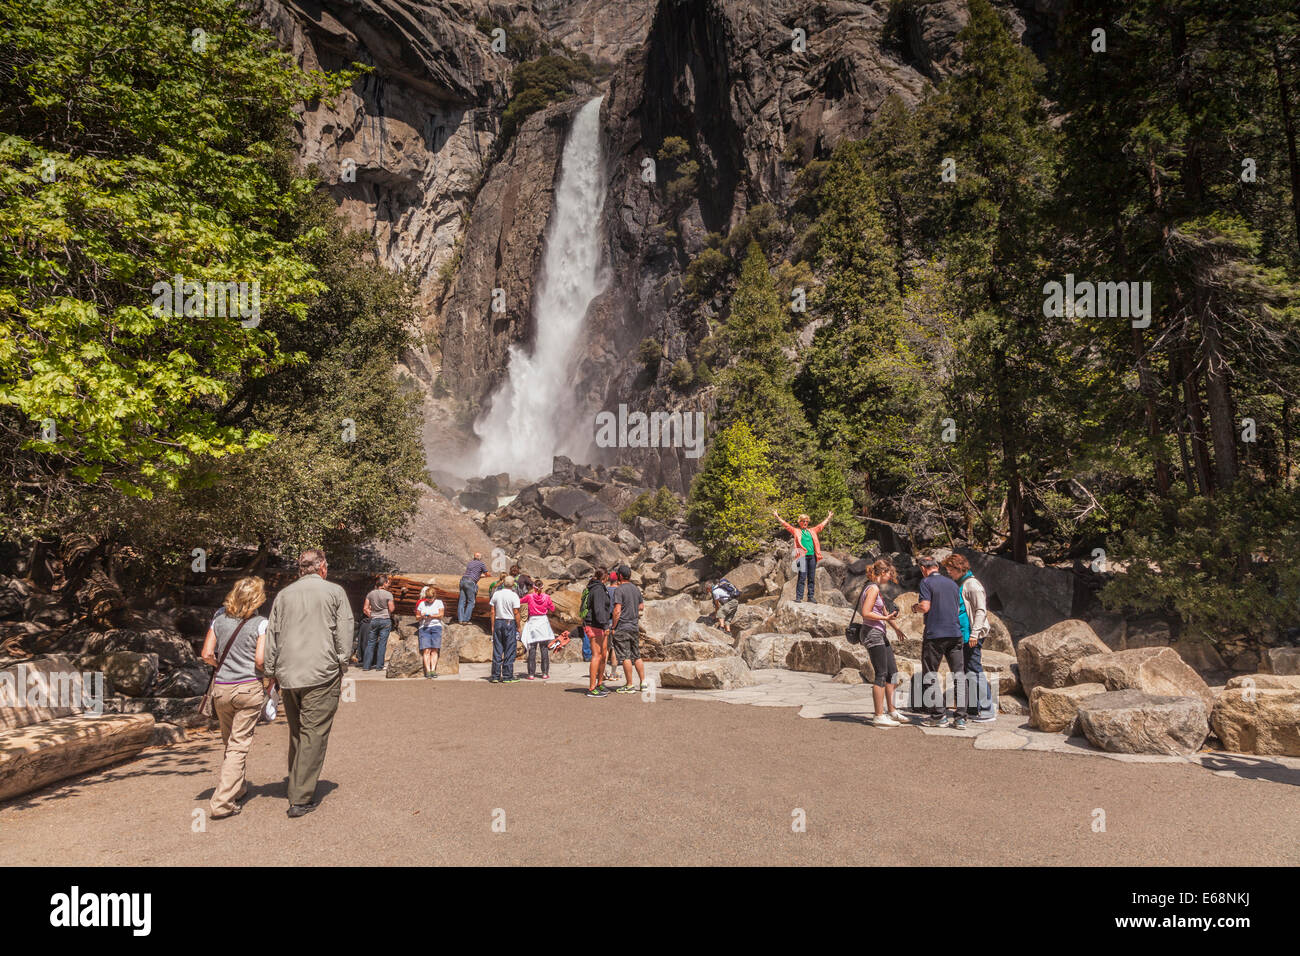 Tourists at Yosemite Falls, Yosemite National Park, California. - Stock Image